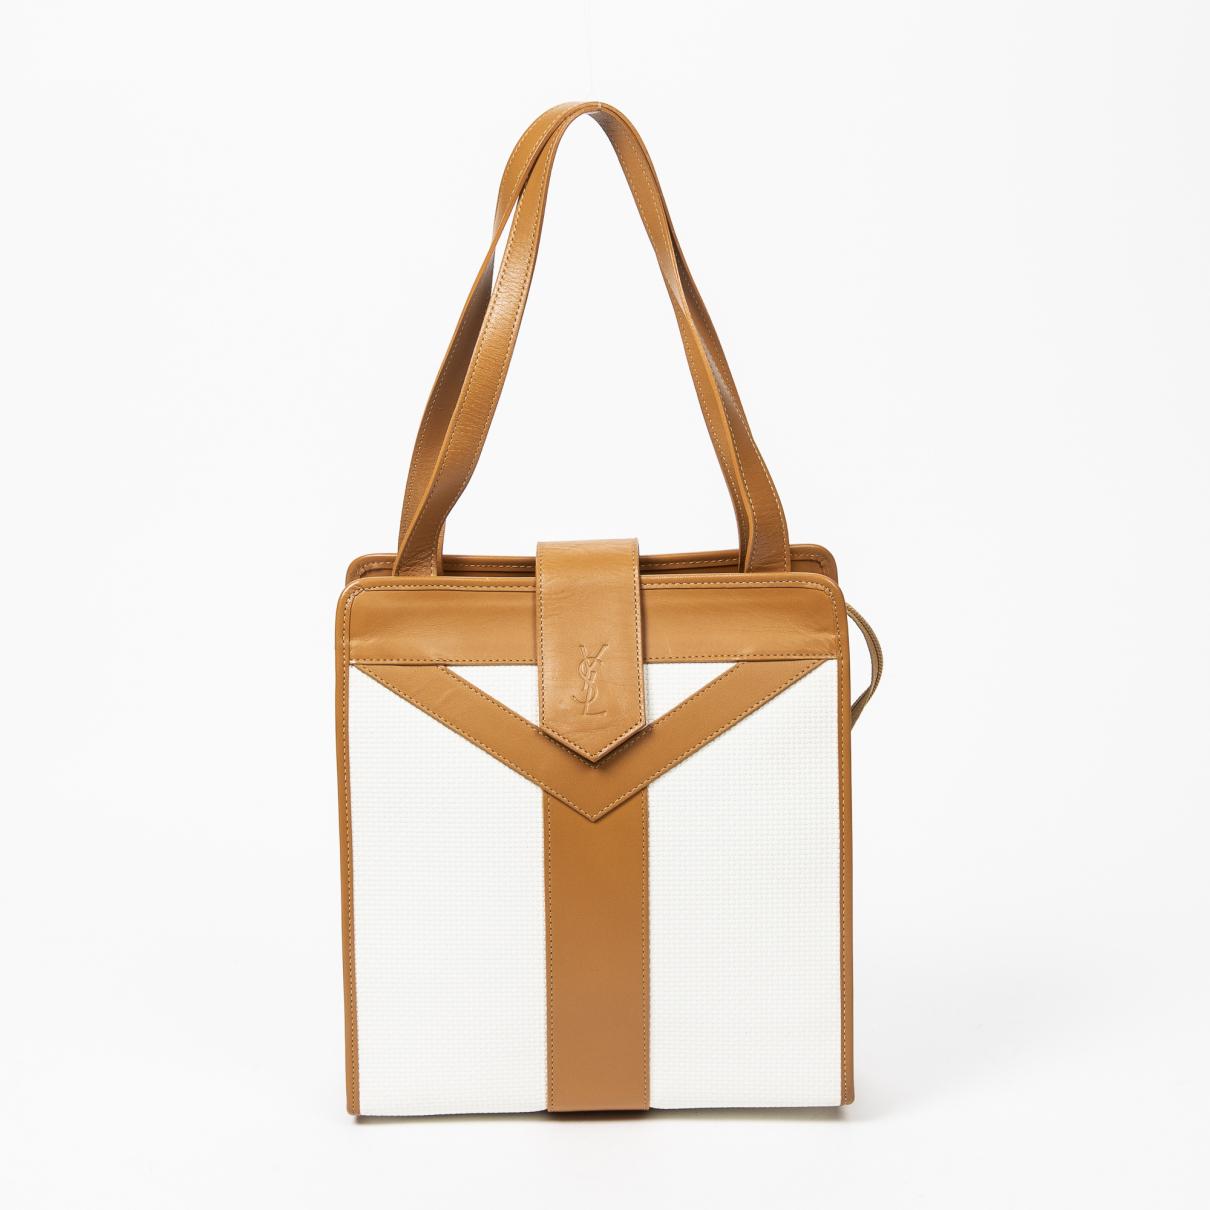 Yves Saint Laurent \N Handtasche in  Weiss Leder